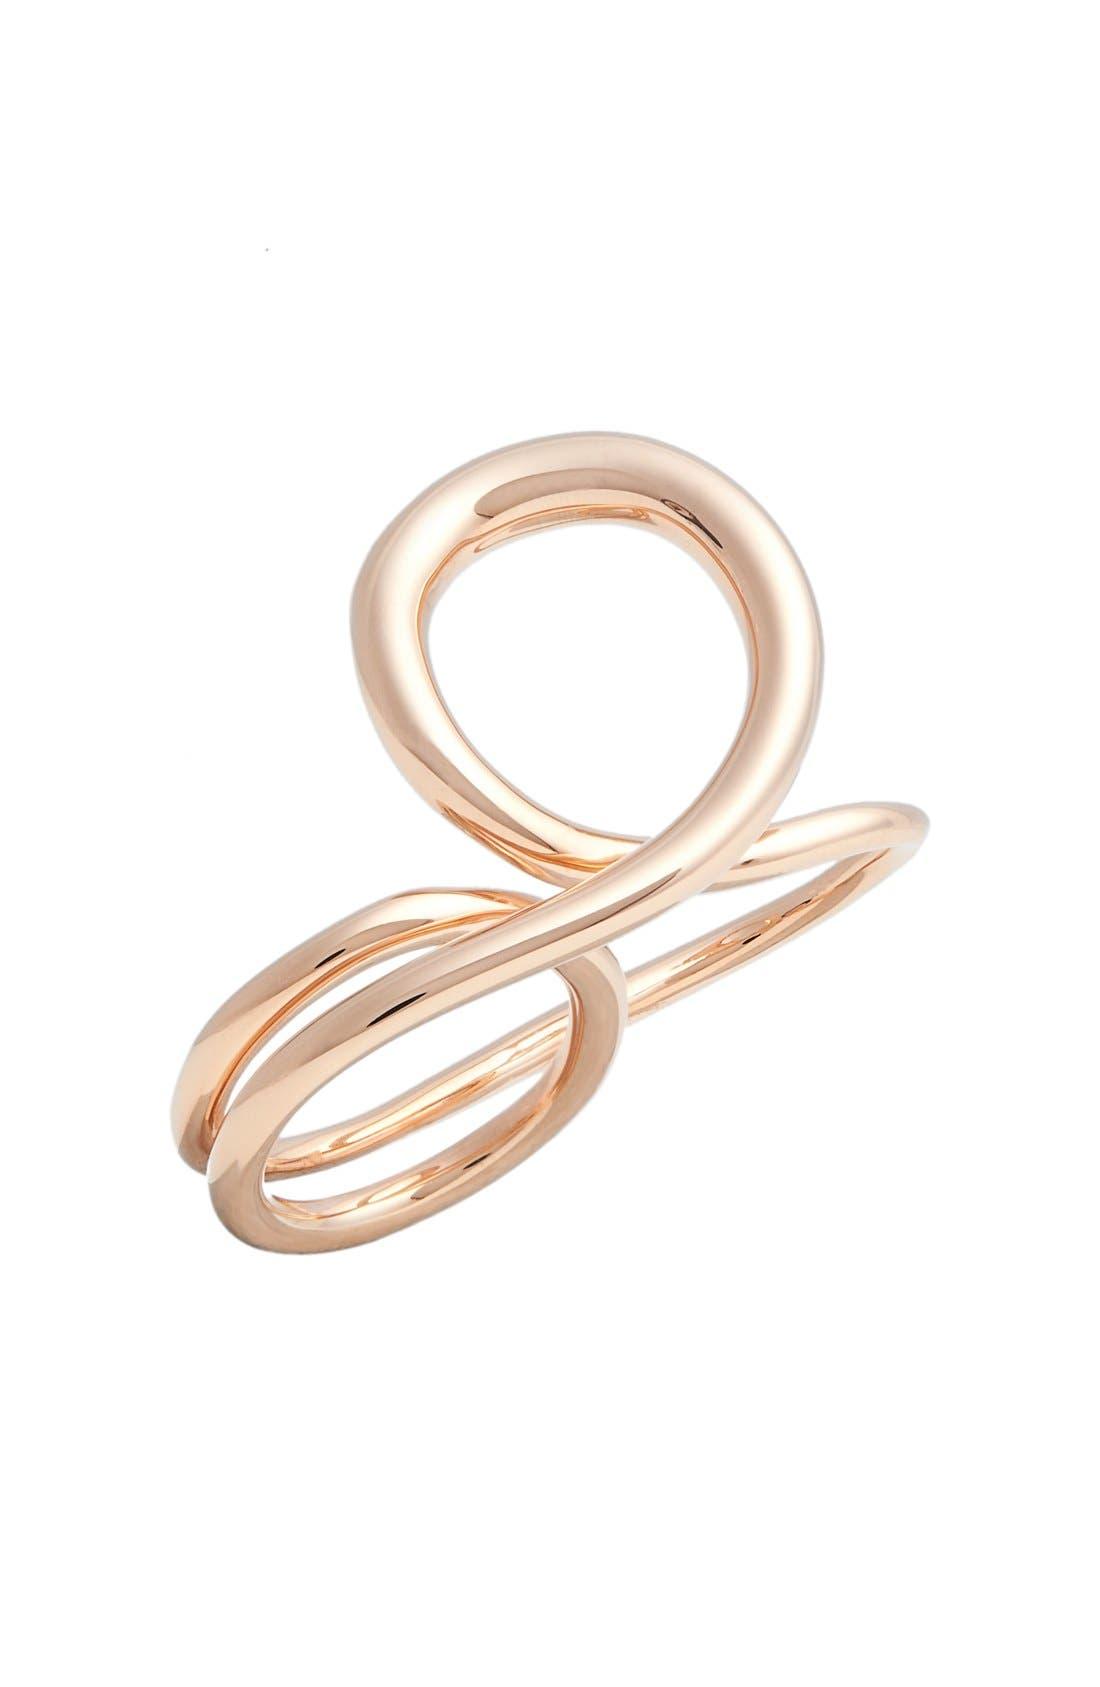 'Gamma Trip' Vermeil Two-Finger Ring,                         Main,                         color, PINK VERMEIL